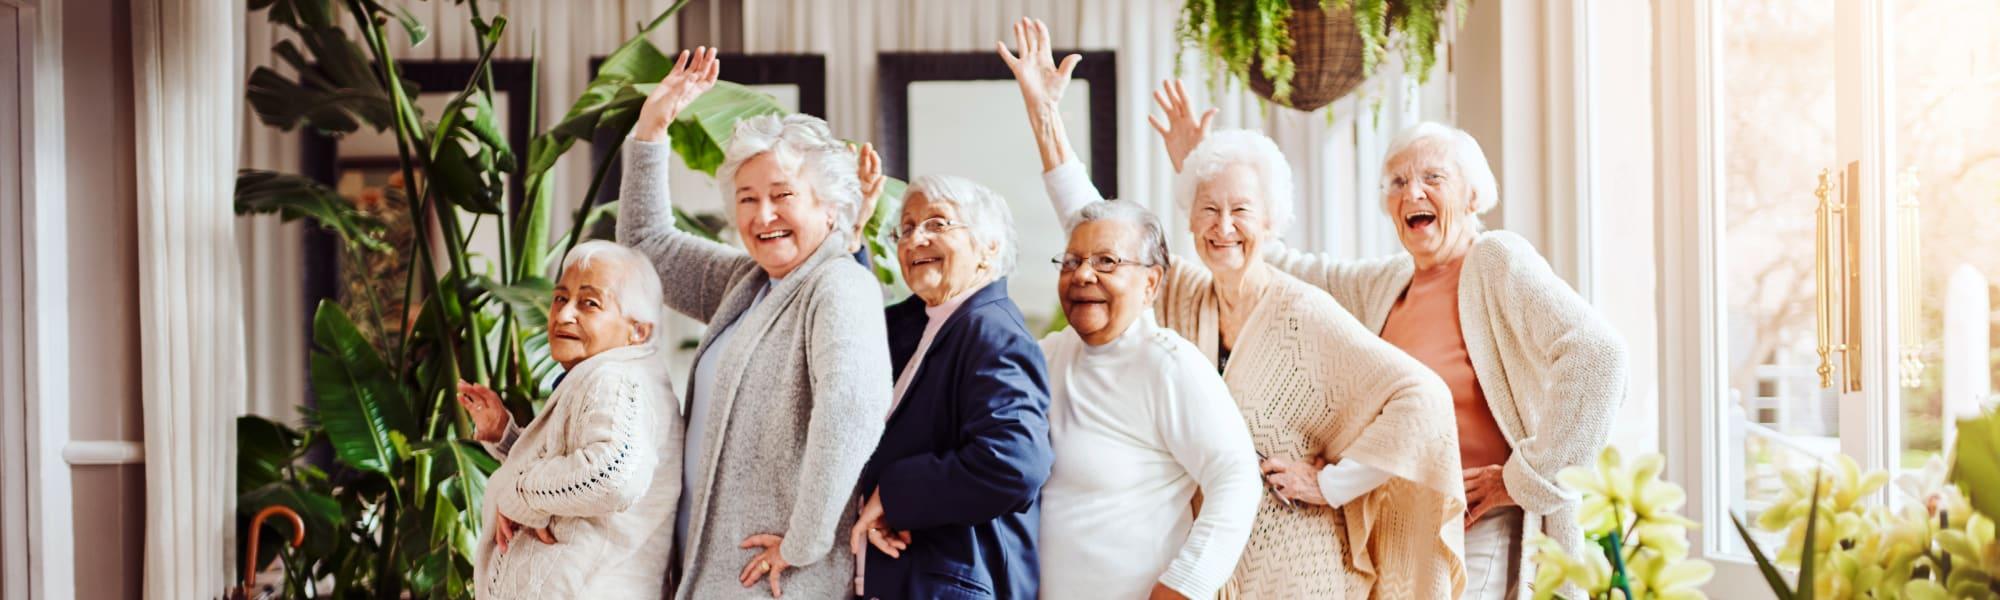 Senior living options at  Mercer Hill at Doylestown in Doylestown, Pennsylvania